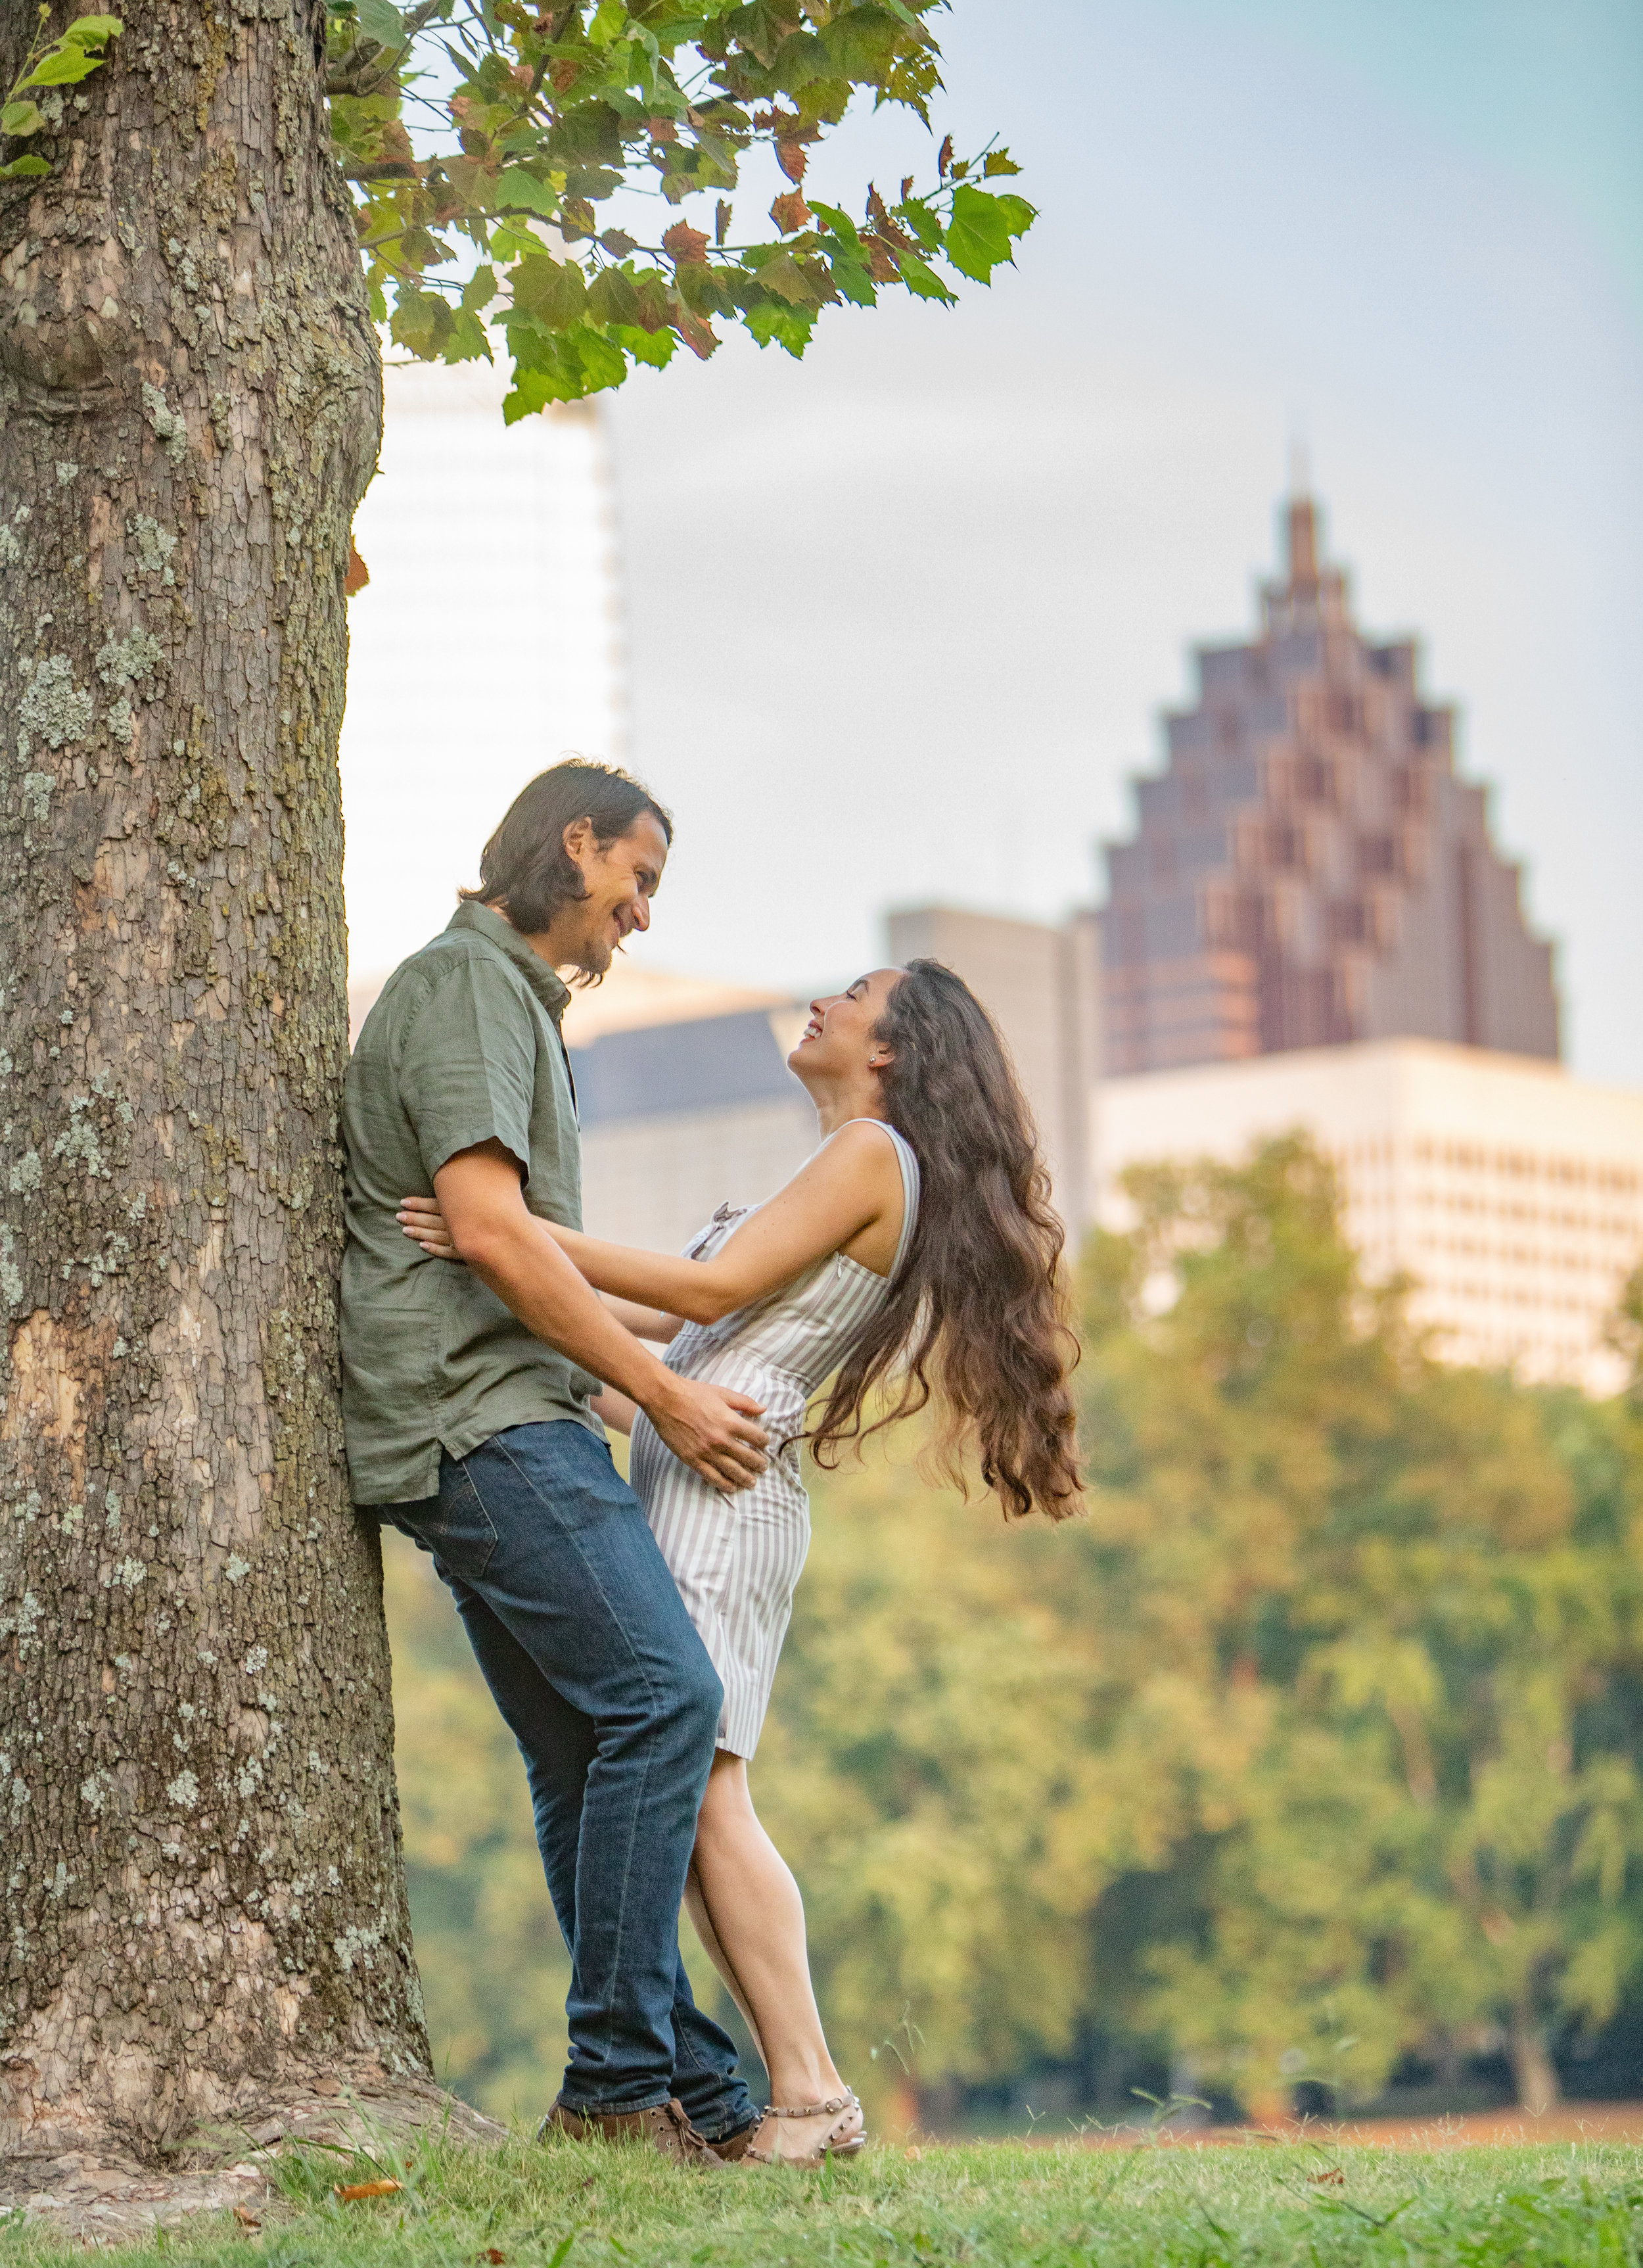 Piedmont Park Engagement Session by the Atlanta Wedding Photographers at AtlantaArtisticWeddings